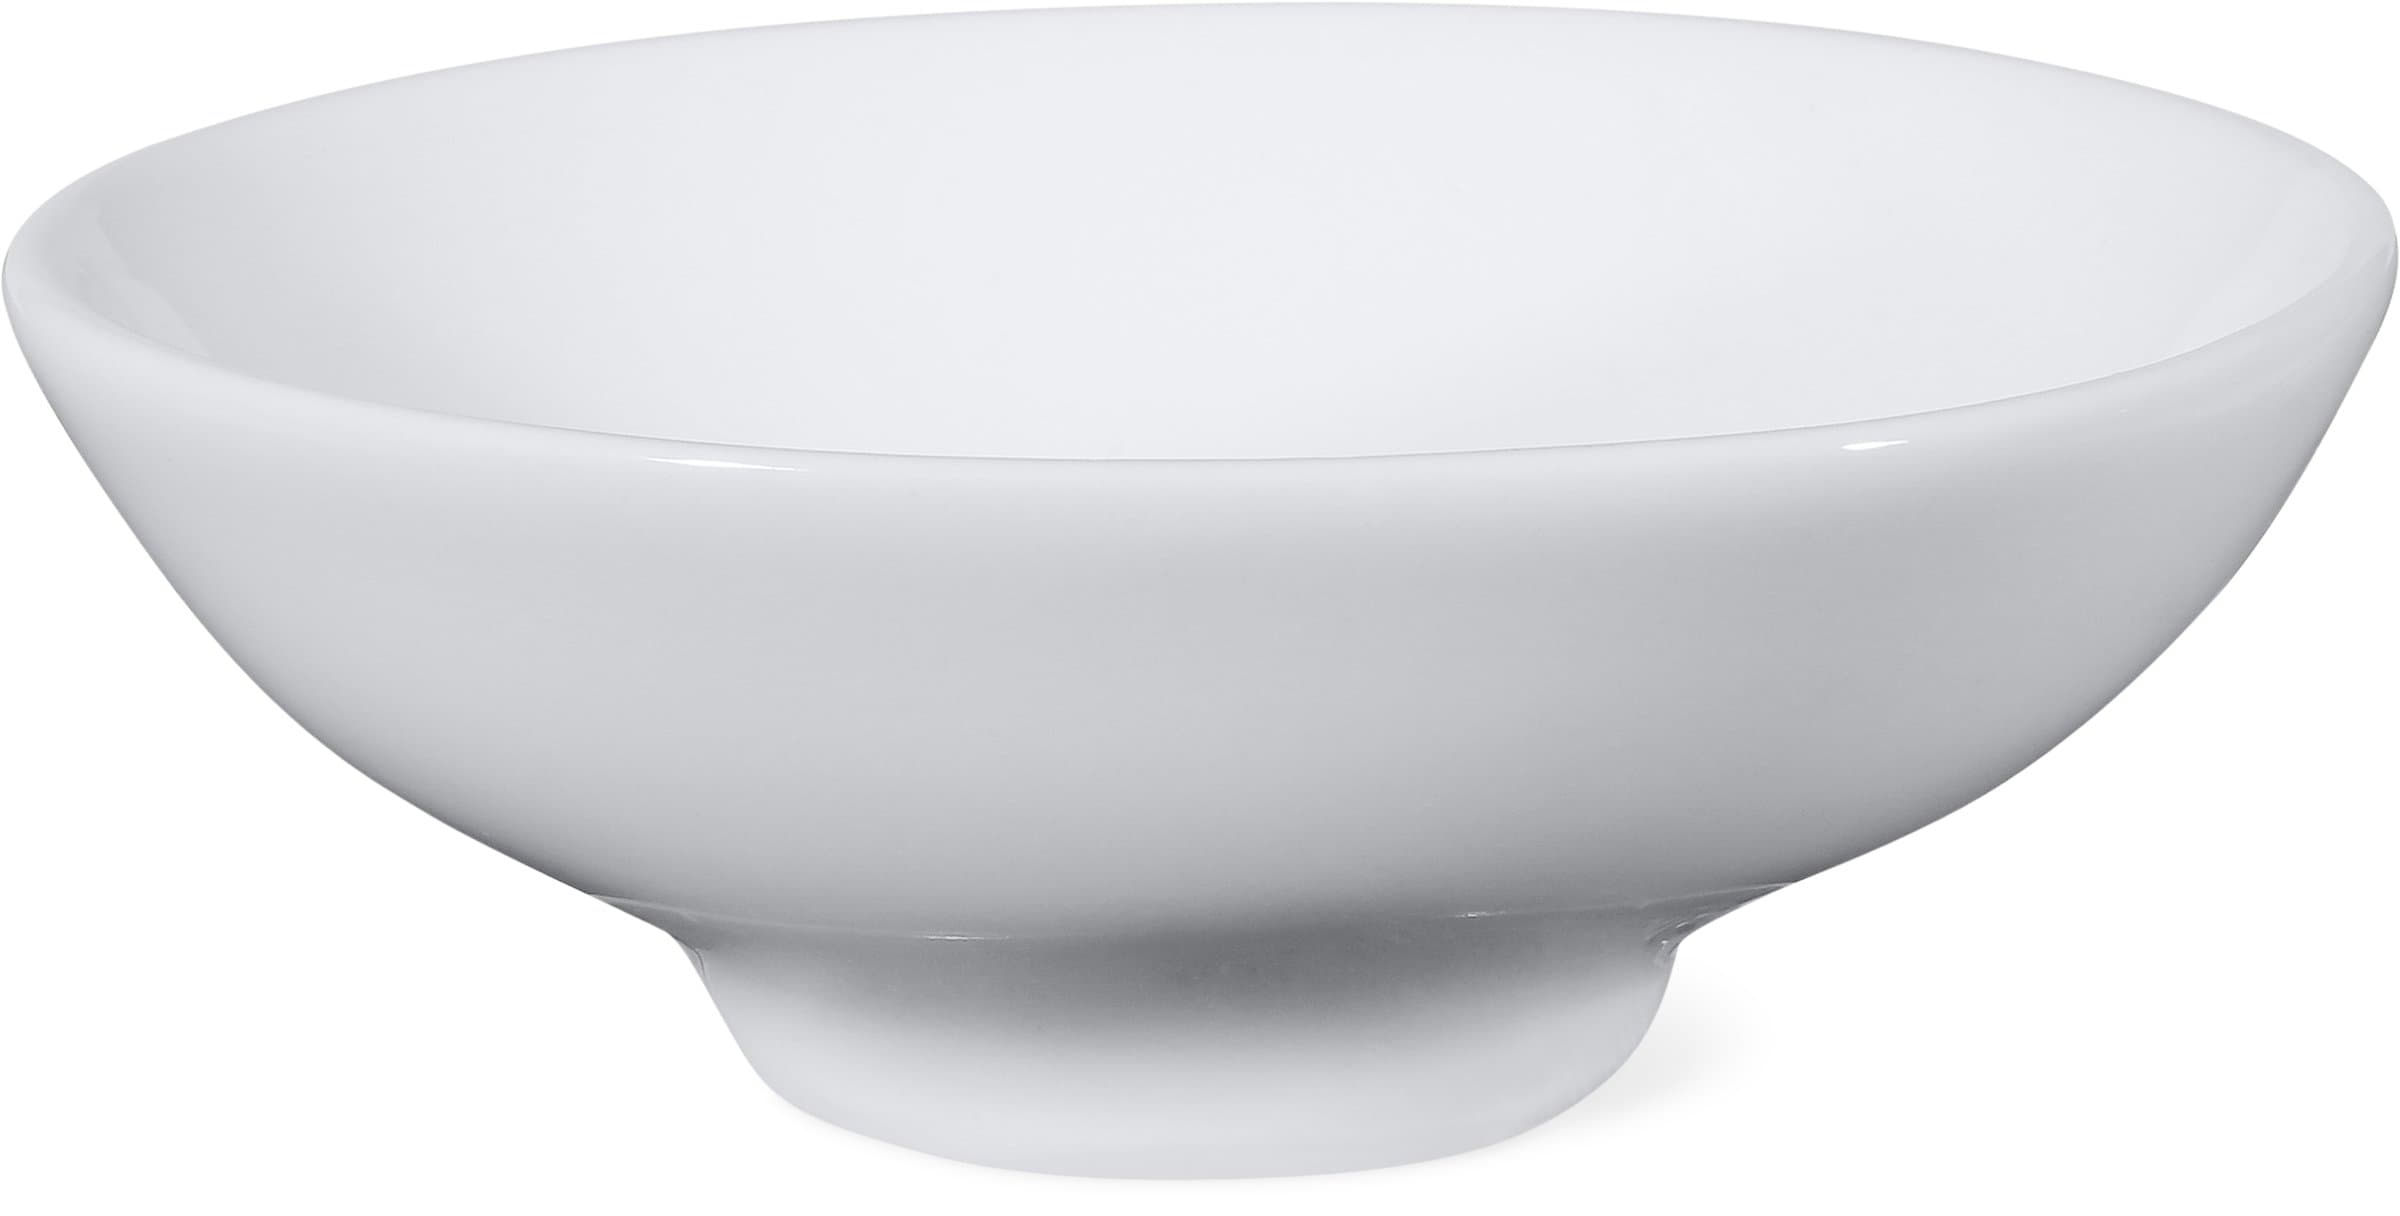 Cucina & Tavola PURE Bol 9.5x8cm